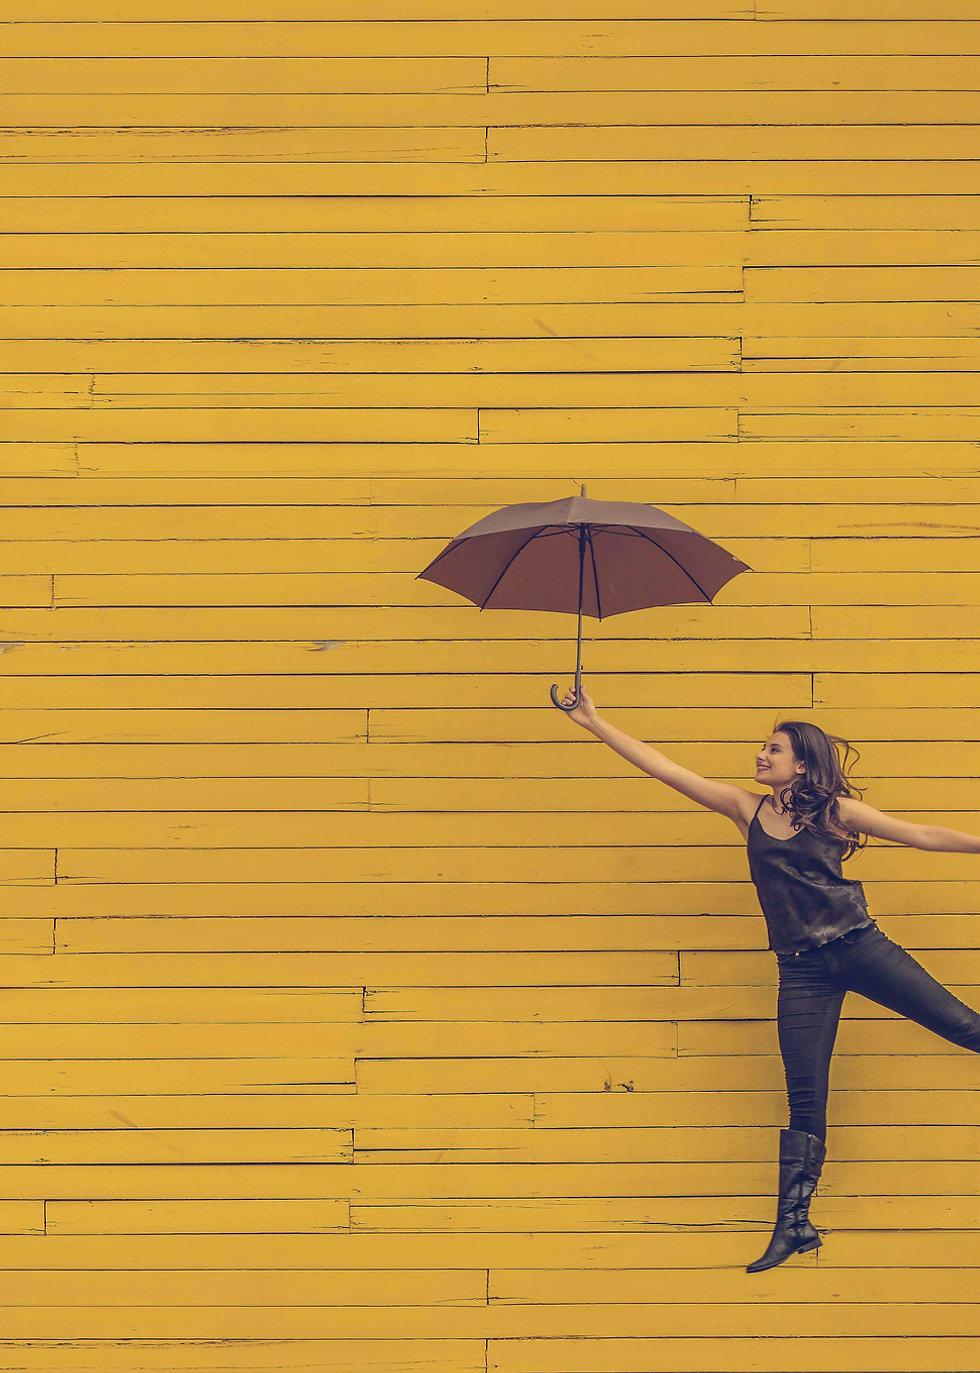 umbrella-small.jpg